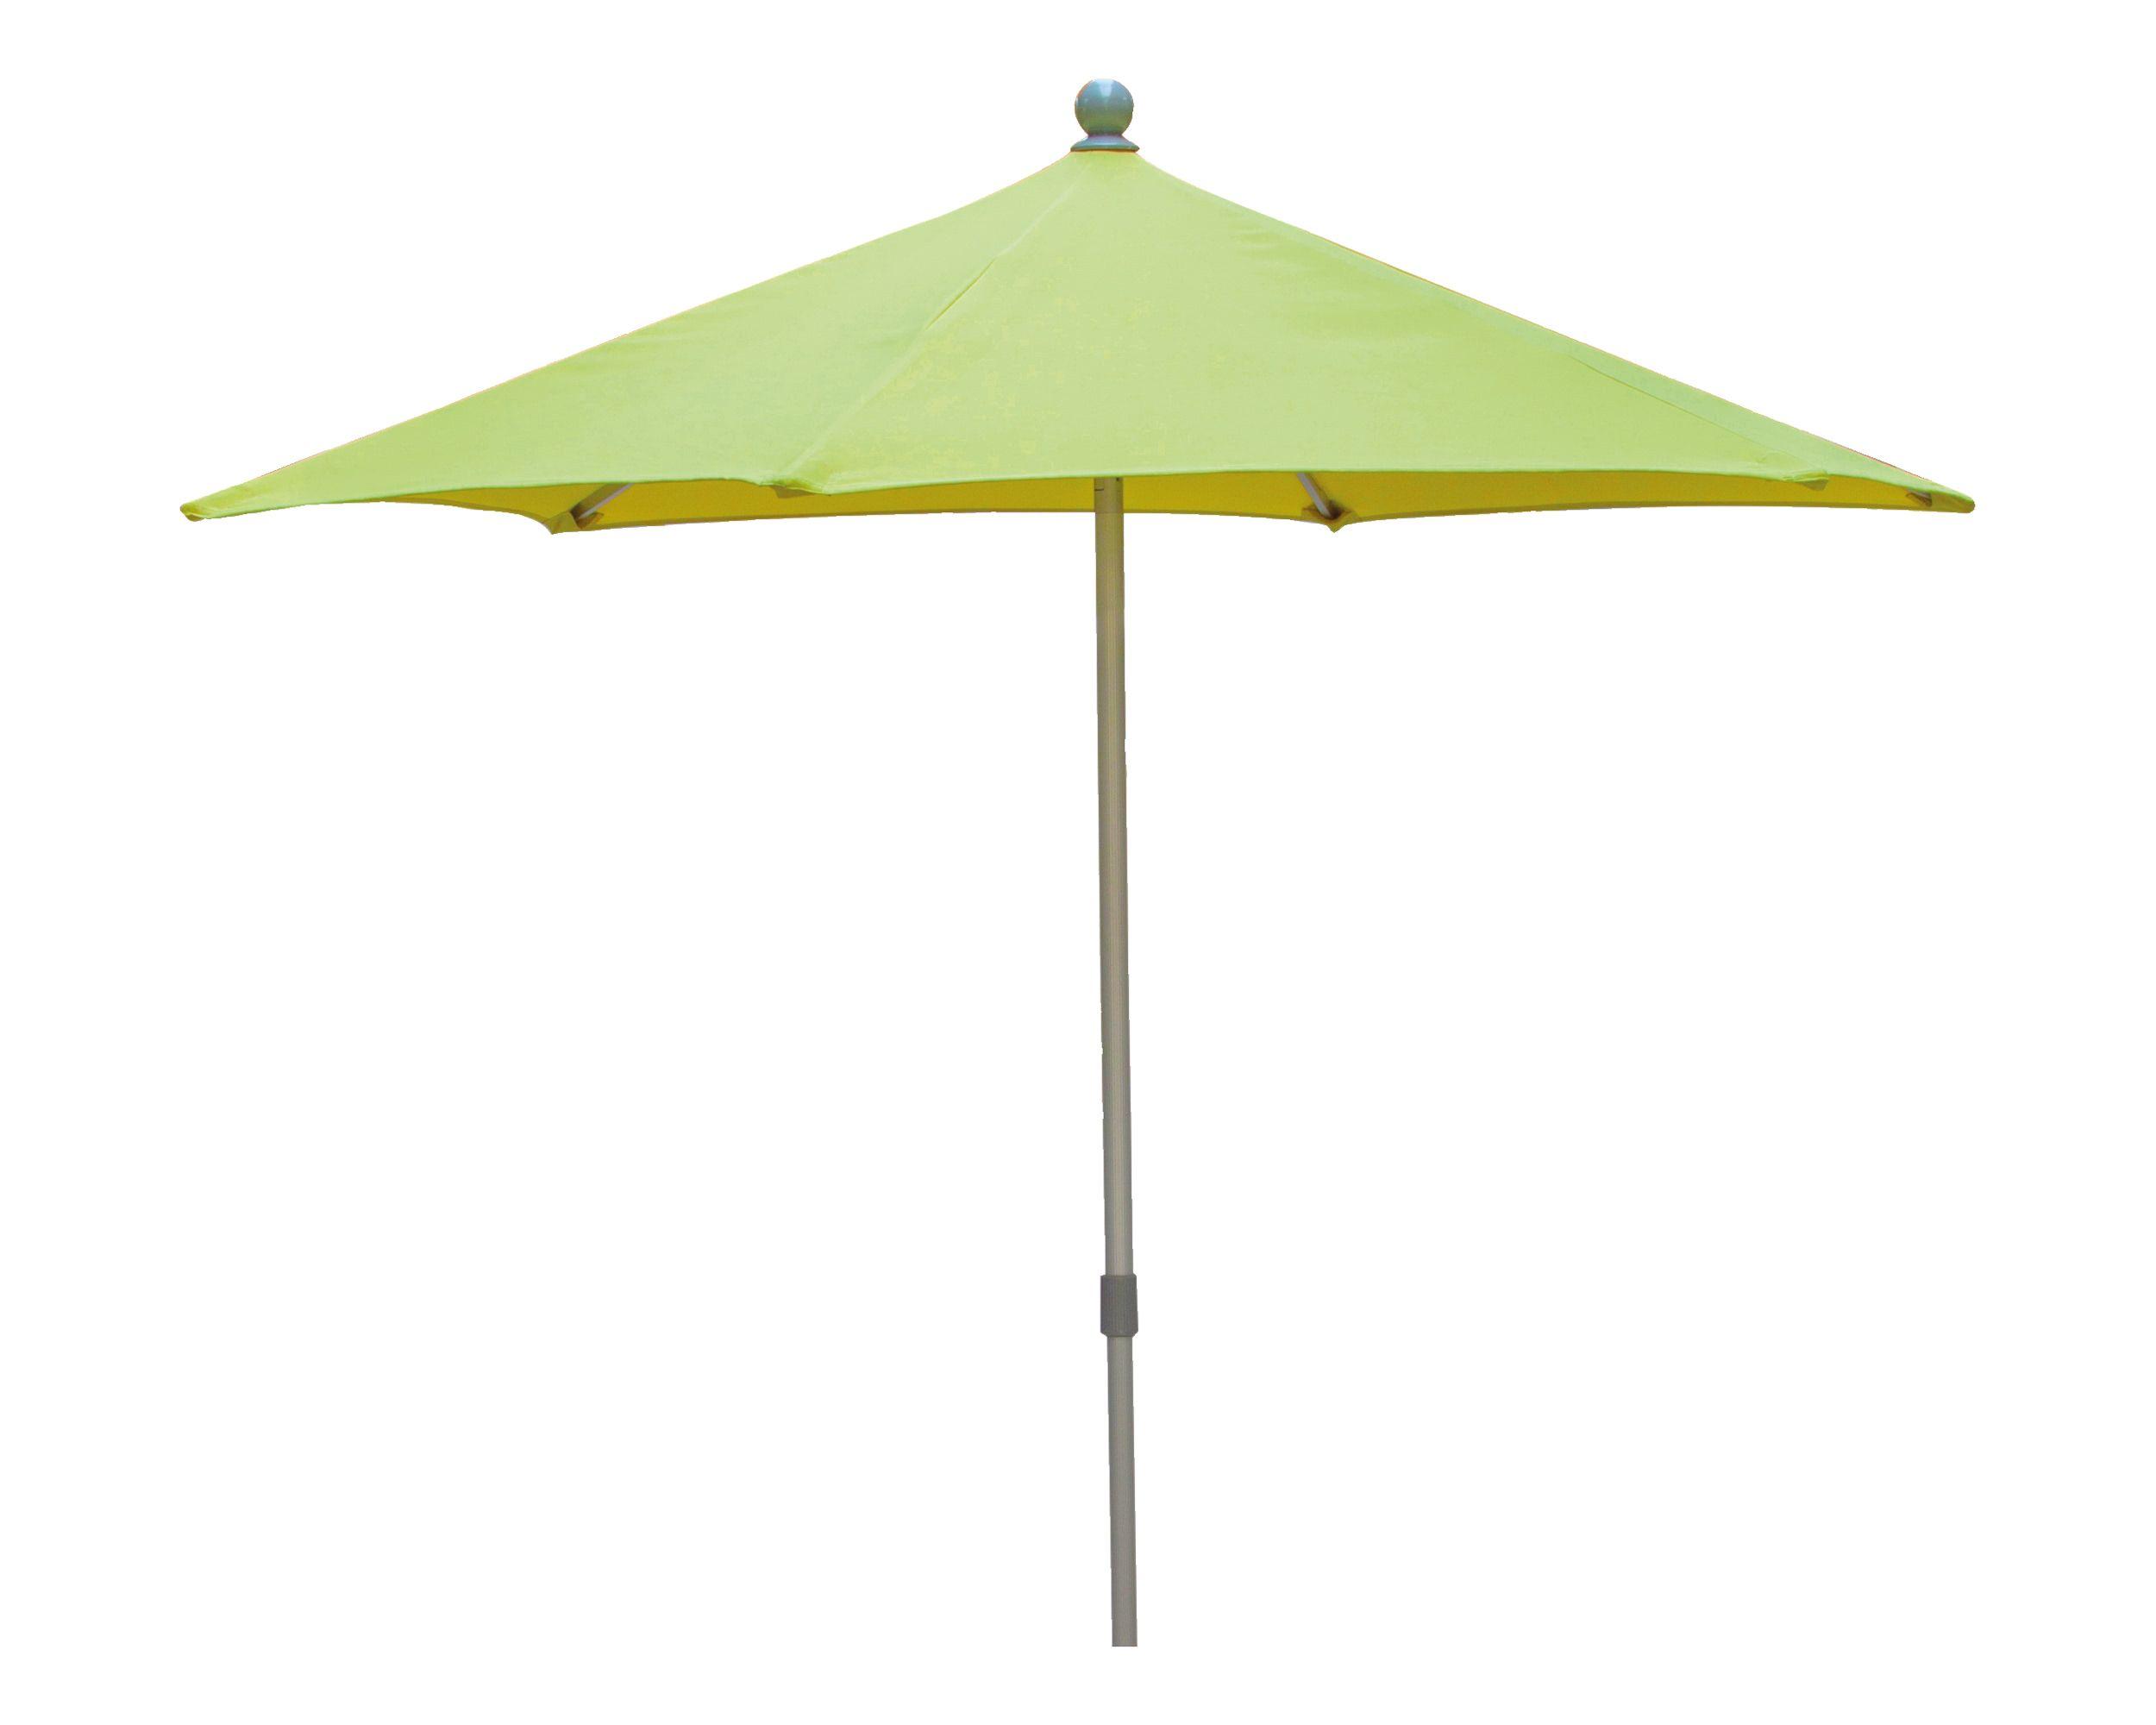 Sonnenschirm Limo Ø 250 cm